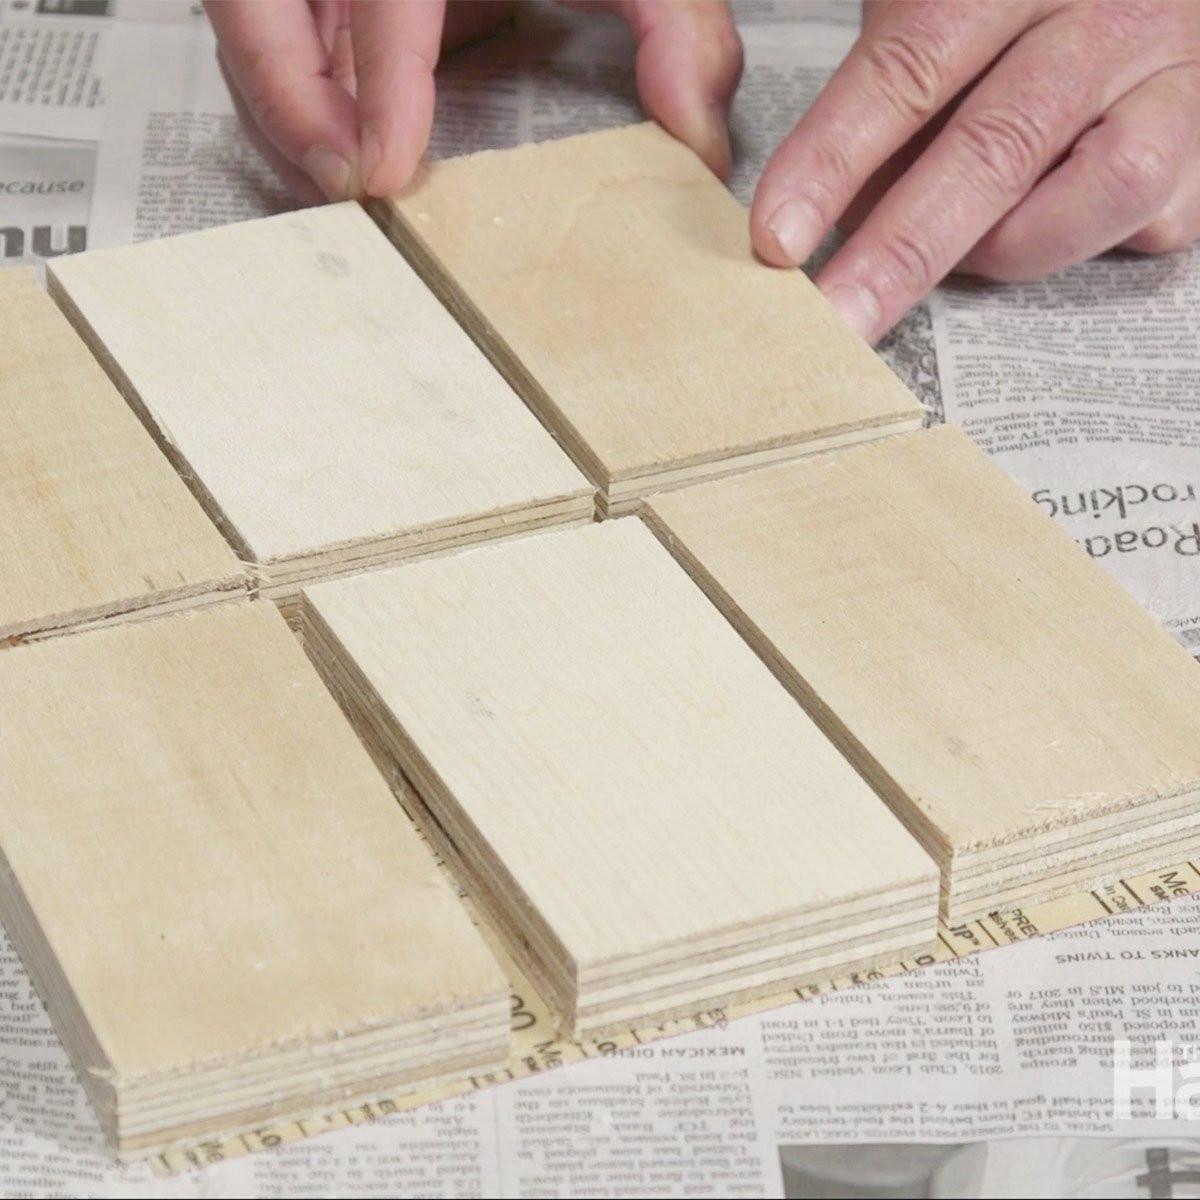 sanding hardwood floors video of 41 genius sanding tips you need to know the family handyman inside disposable sanding blocks